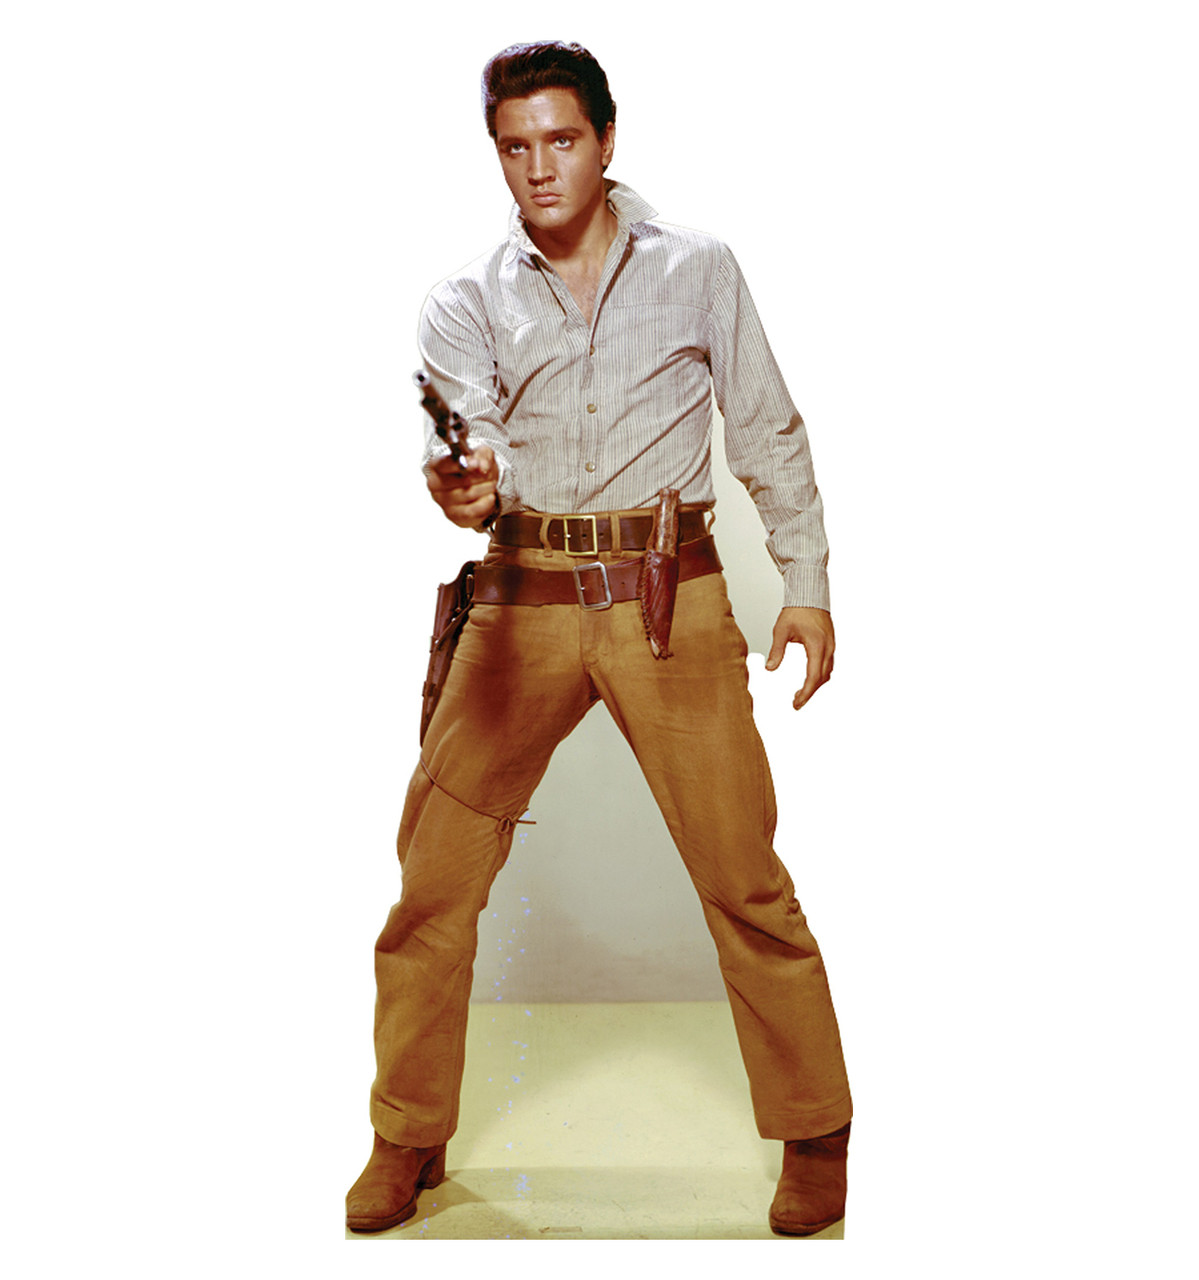 Life-size Elvis Gunfighter - Talking Cardboard Standup | Cardboard Cutout